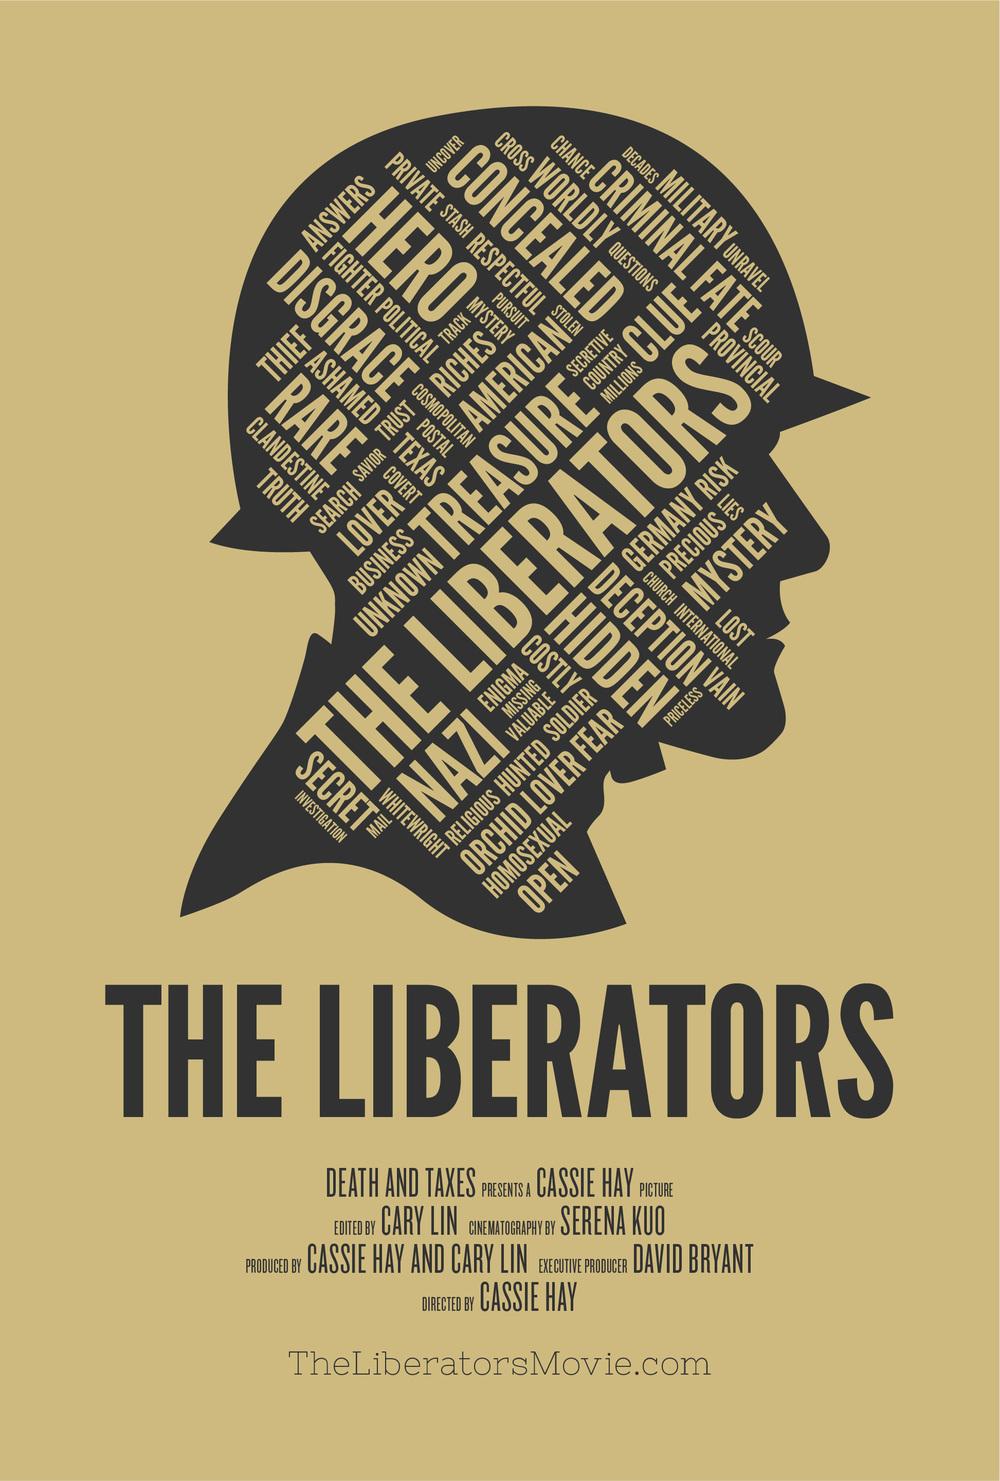 TheLiberators_FilmPoster.jpg